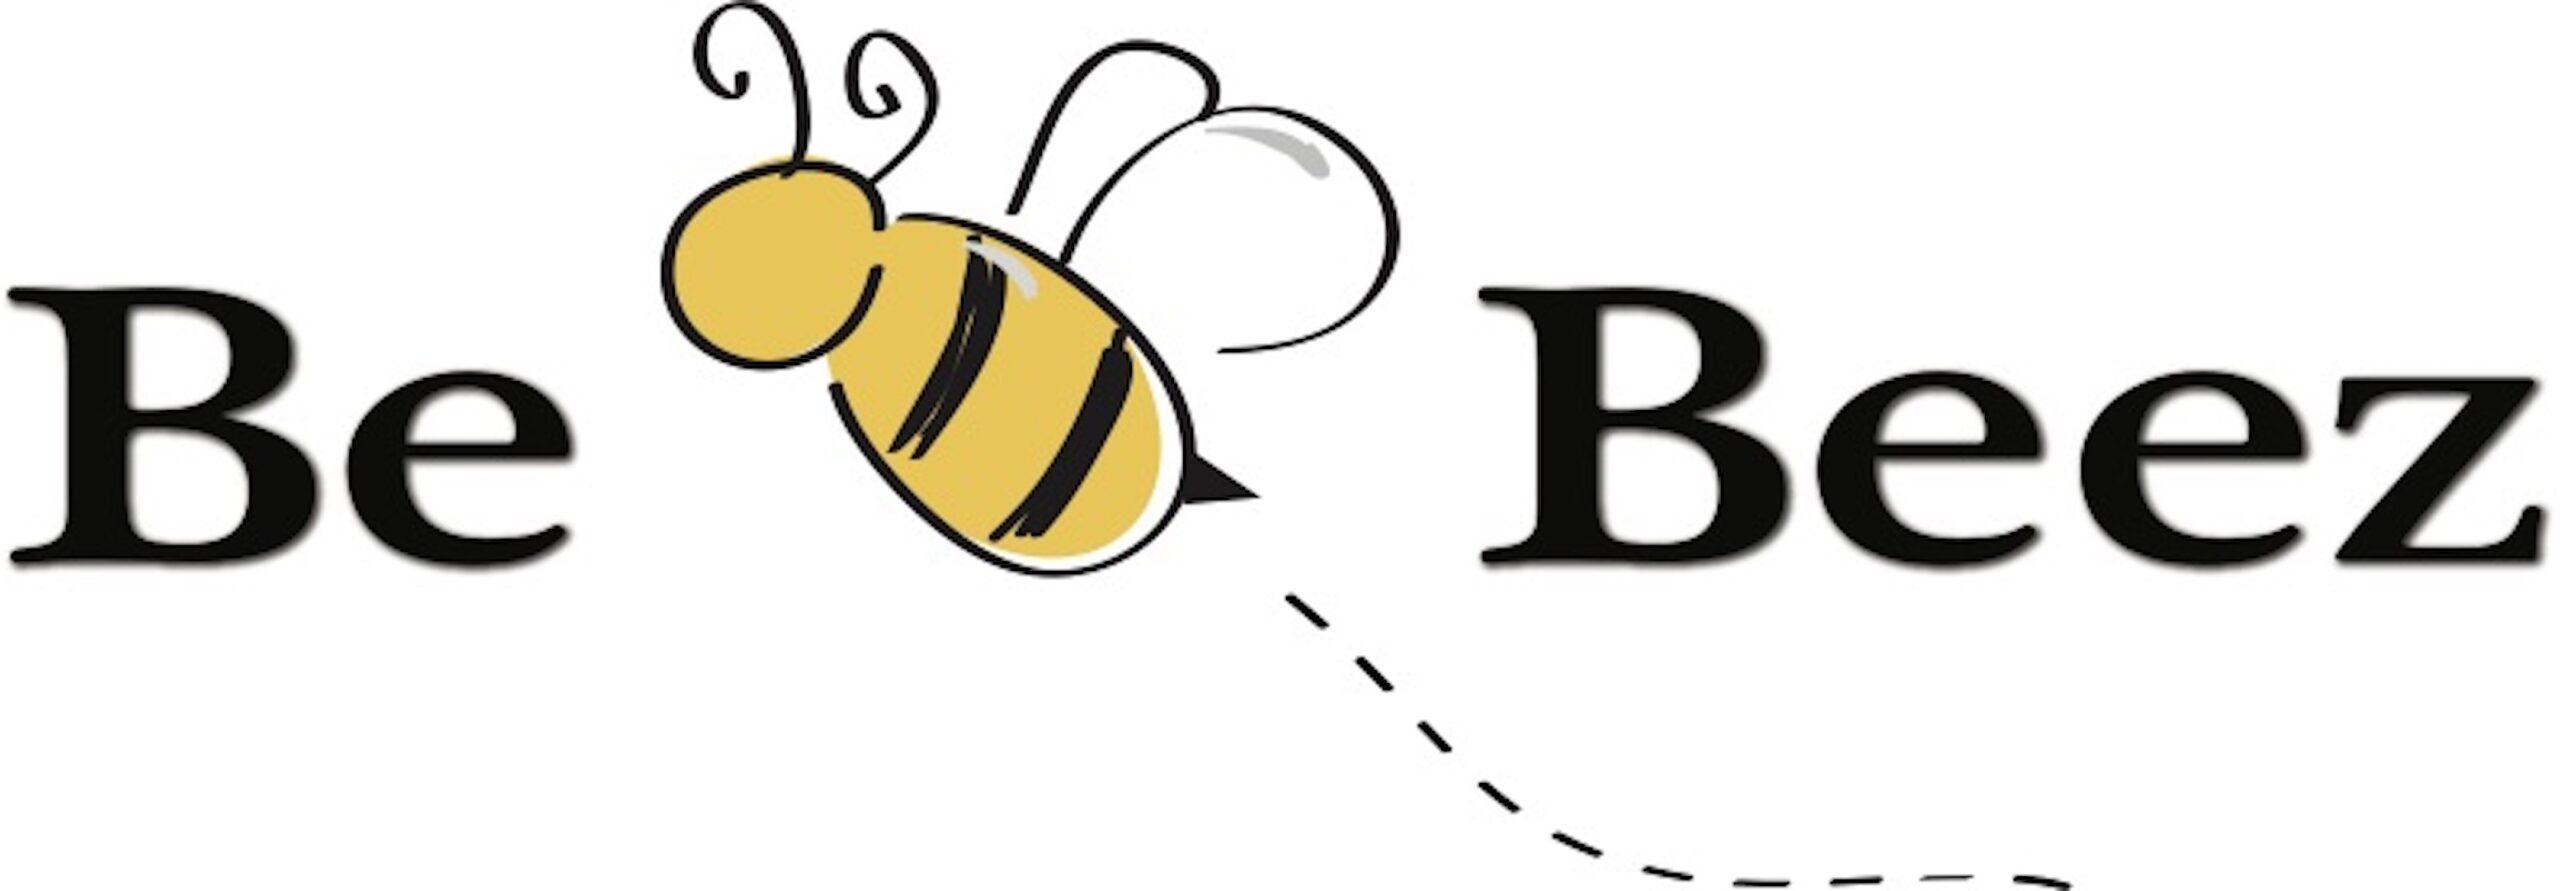 BeBeez logo con ombra